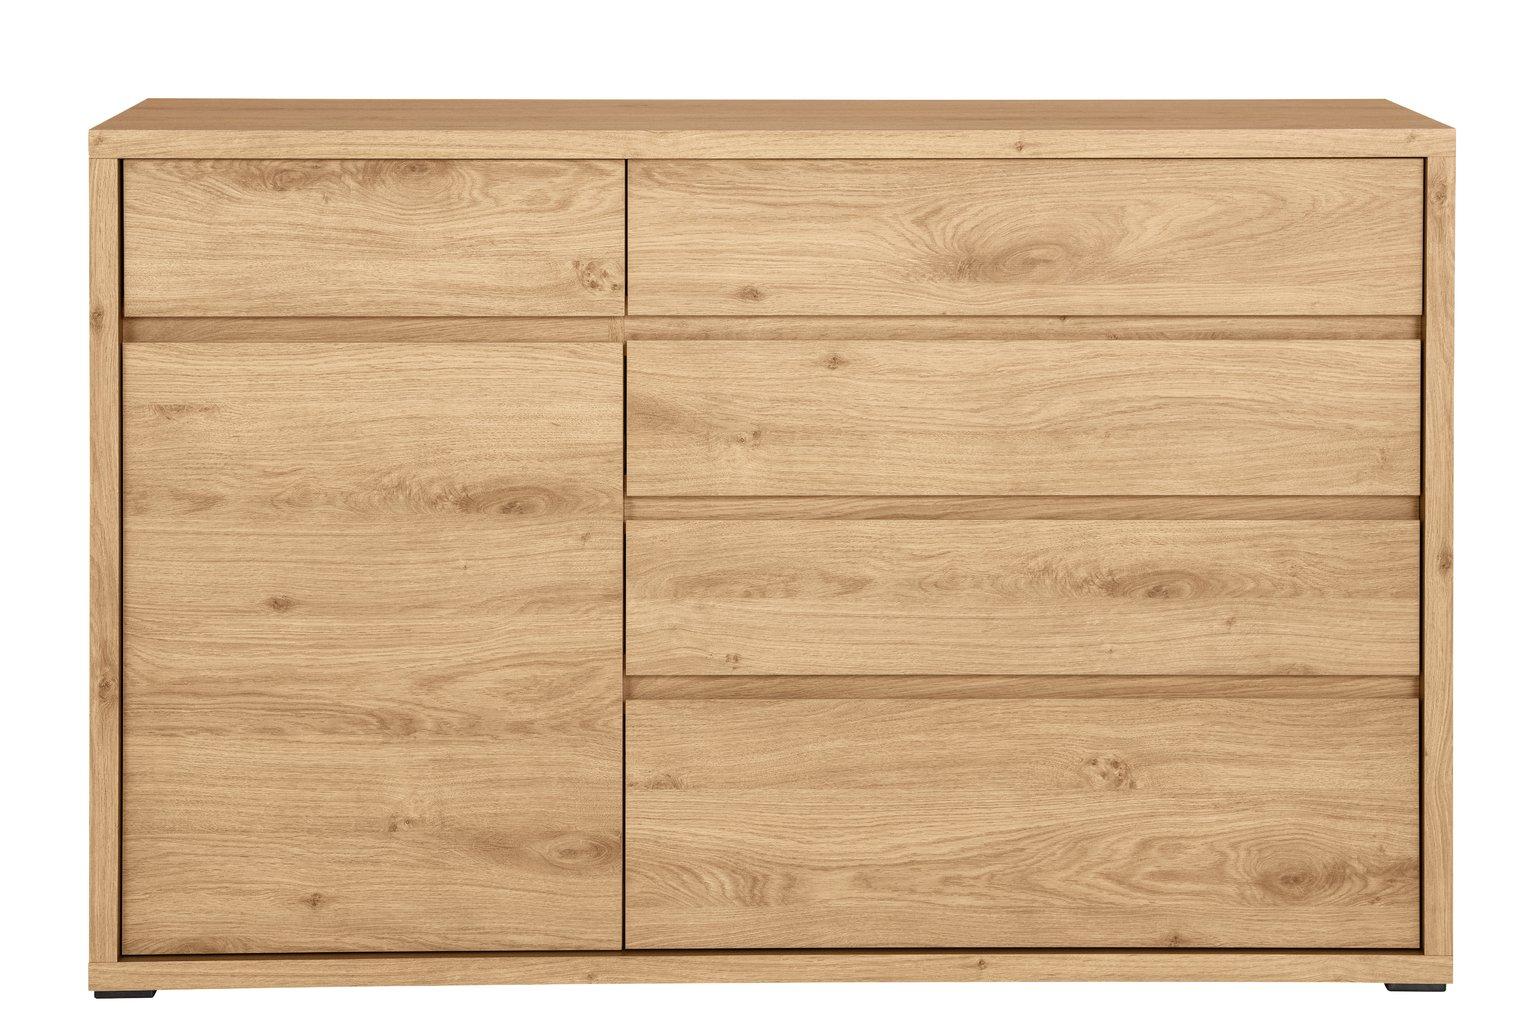 Argos Home Shetland 1 Door 5 Drawer Chest - Oak Effect £62.95 Delivered @ Argos